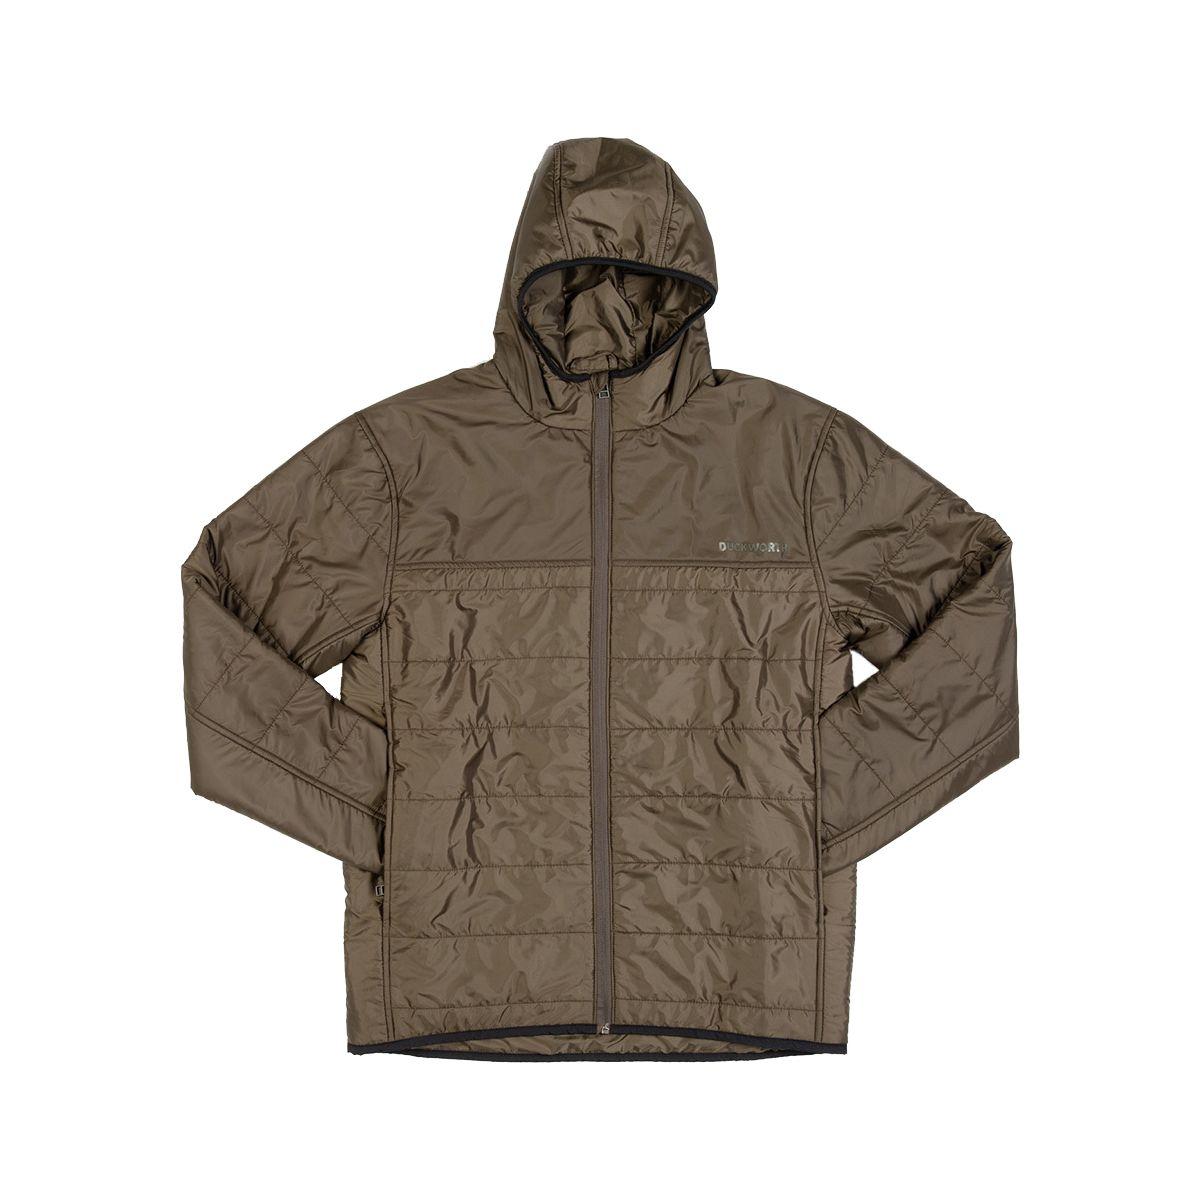 Duckworth WoolCloud Hooded Insulated Jacket - Men